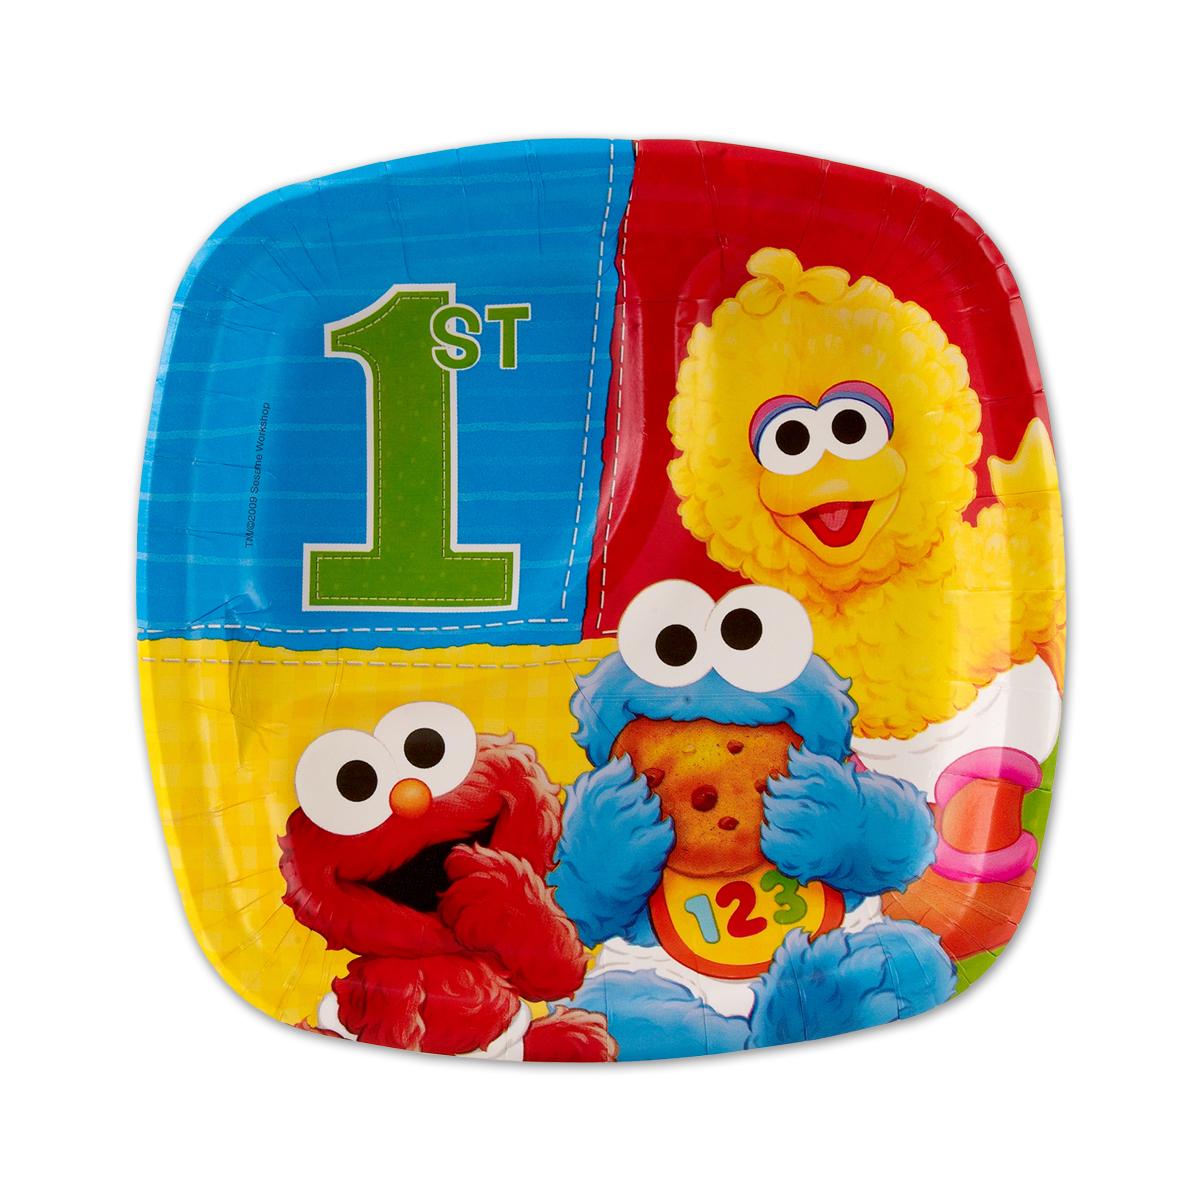 Sesame Street Birthday Invitation was best invitations ideas